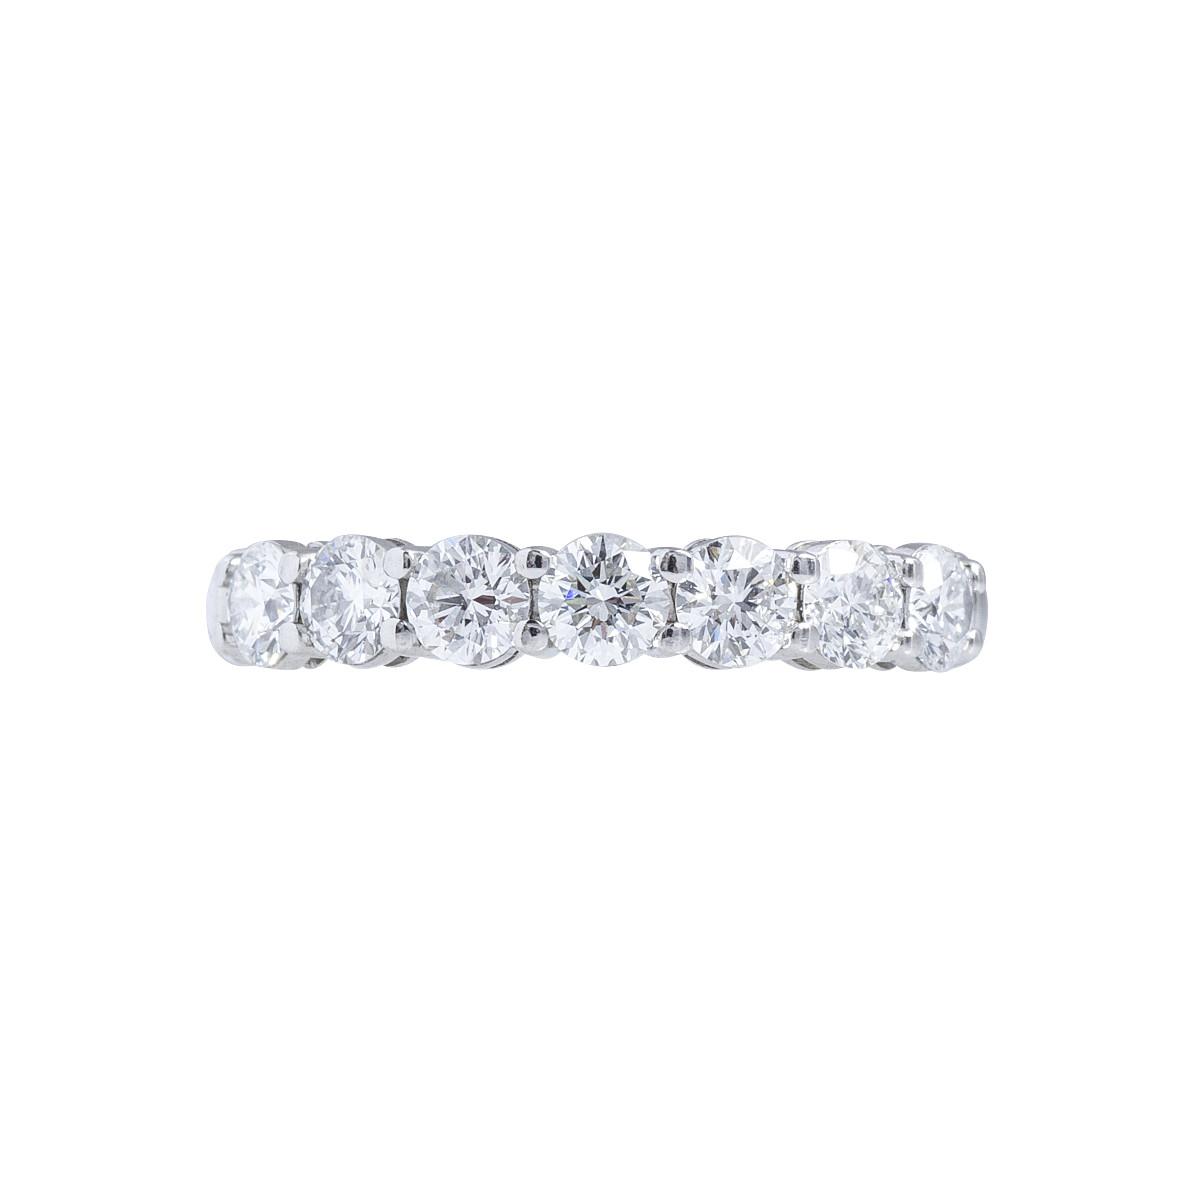 Vintage Tiffany & Co. 0.93 CTW Diamond Anniversary Band